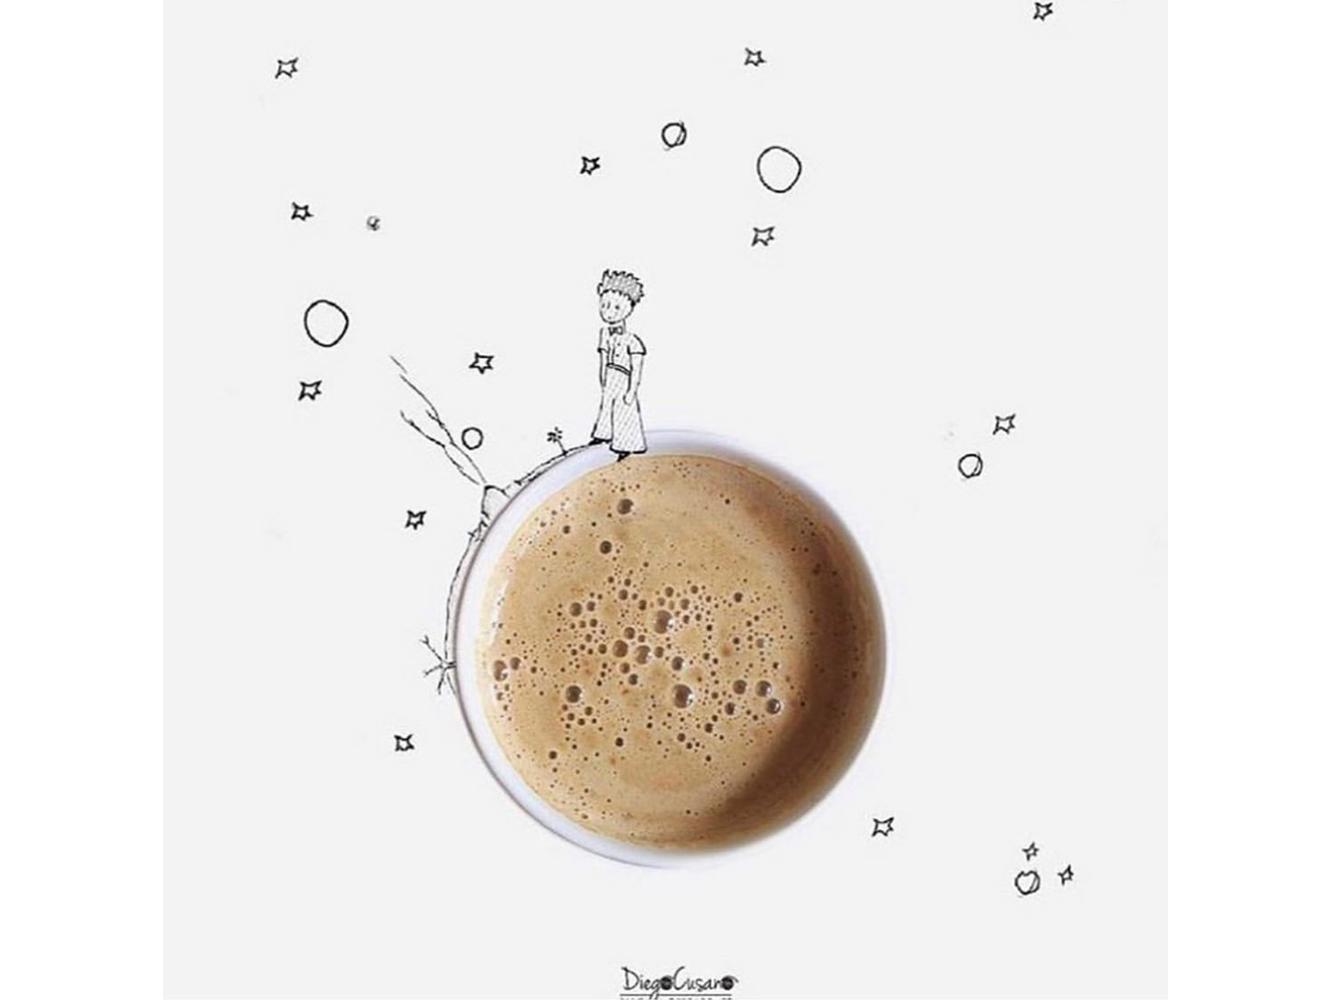 Diego Cusano Illustration